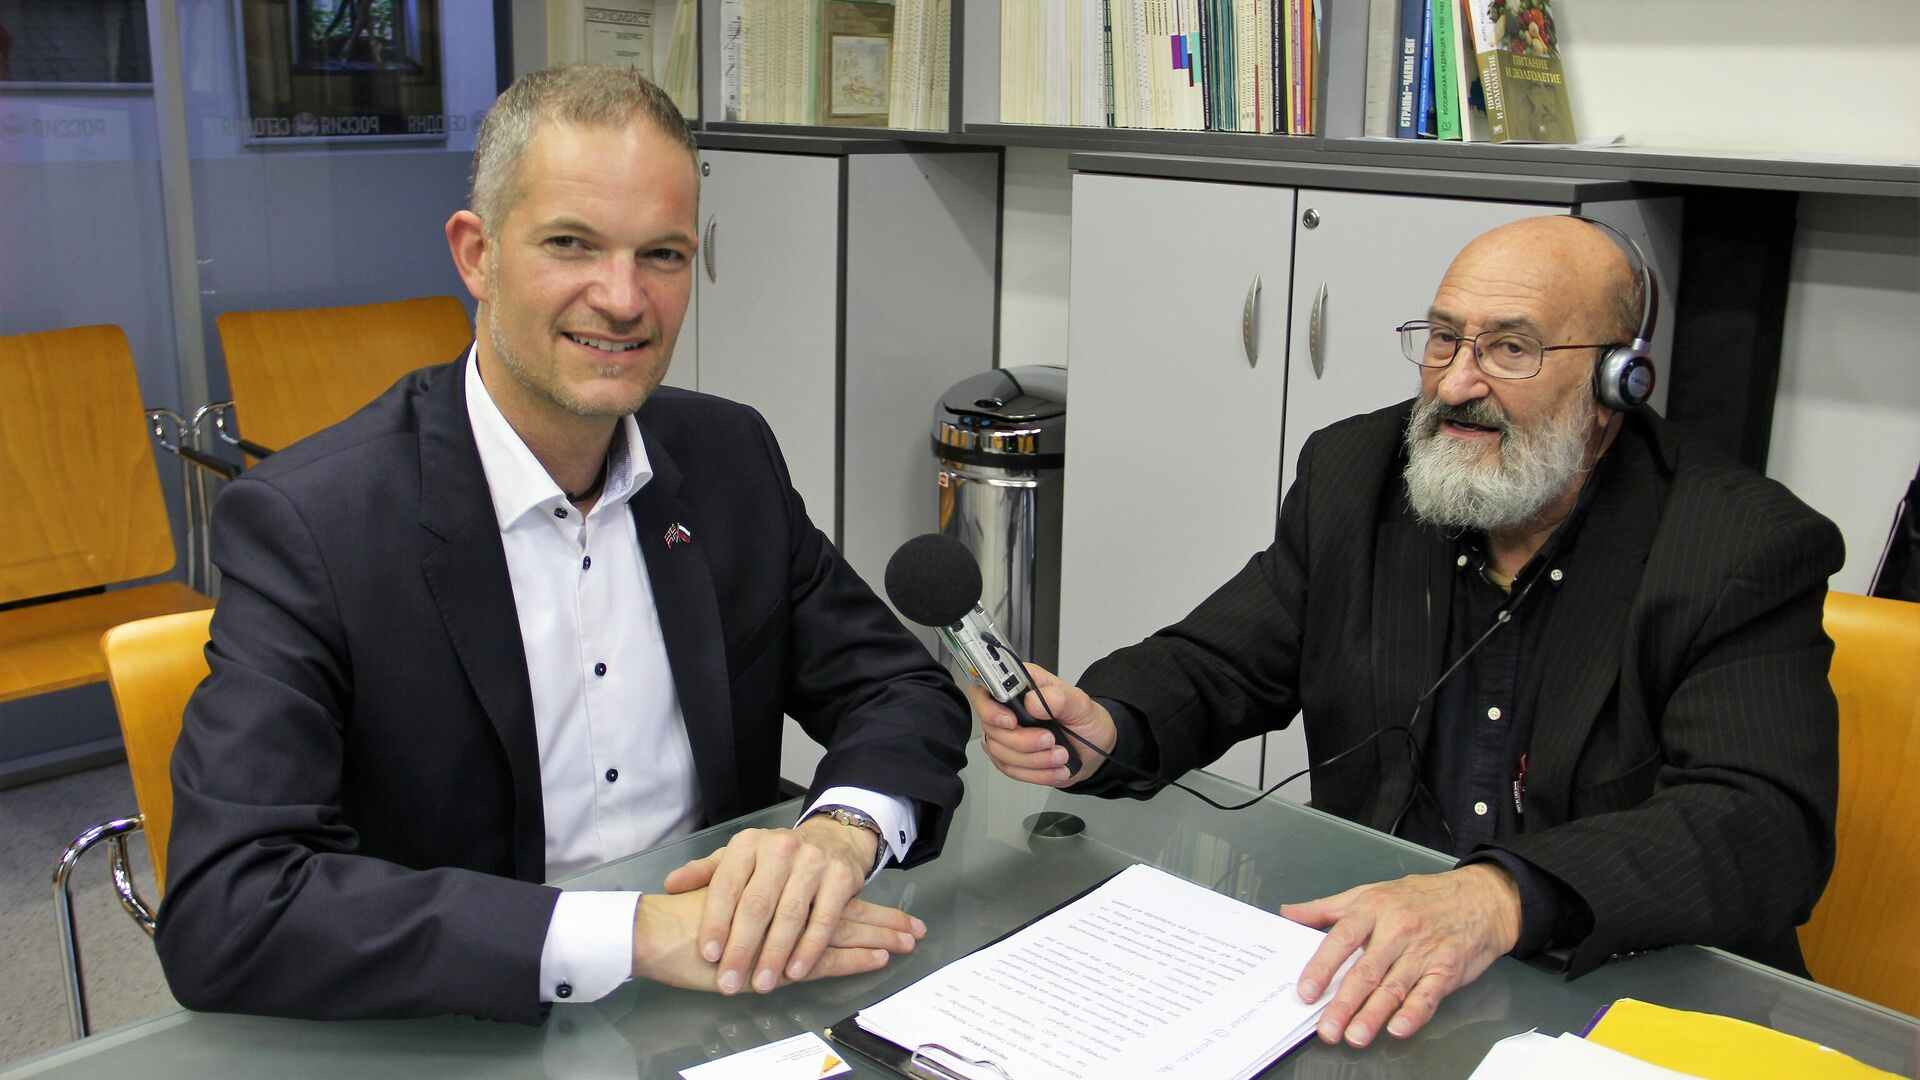 Hendrik Weber (l.) im Gespräch mit dem SNA-Korrespondenten Nikolaj Jolkin - SNA, 1920, 06.10.2021